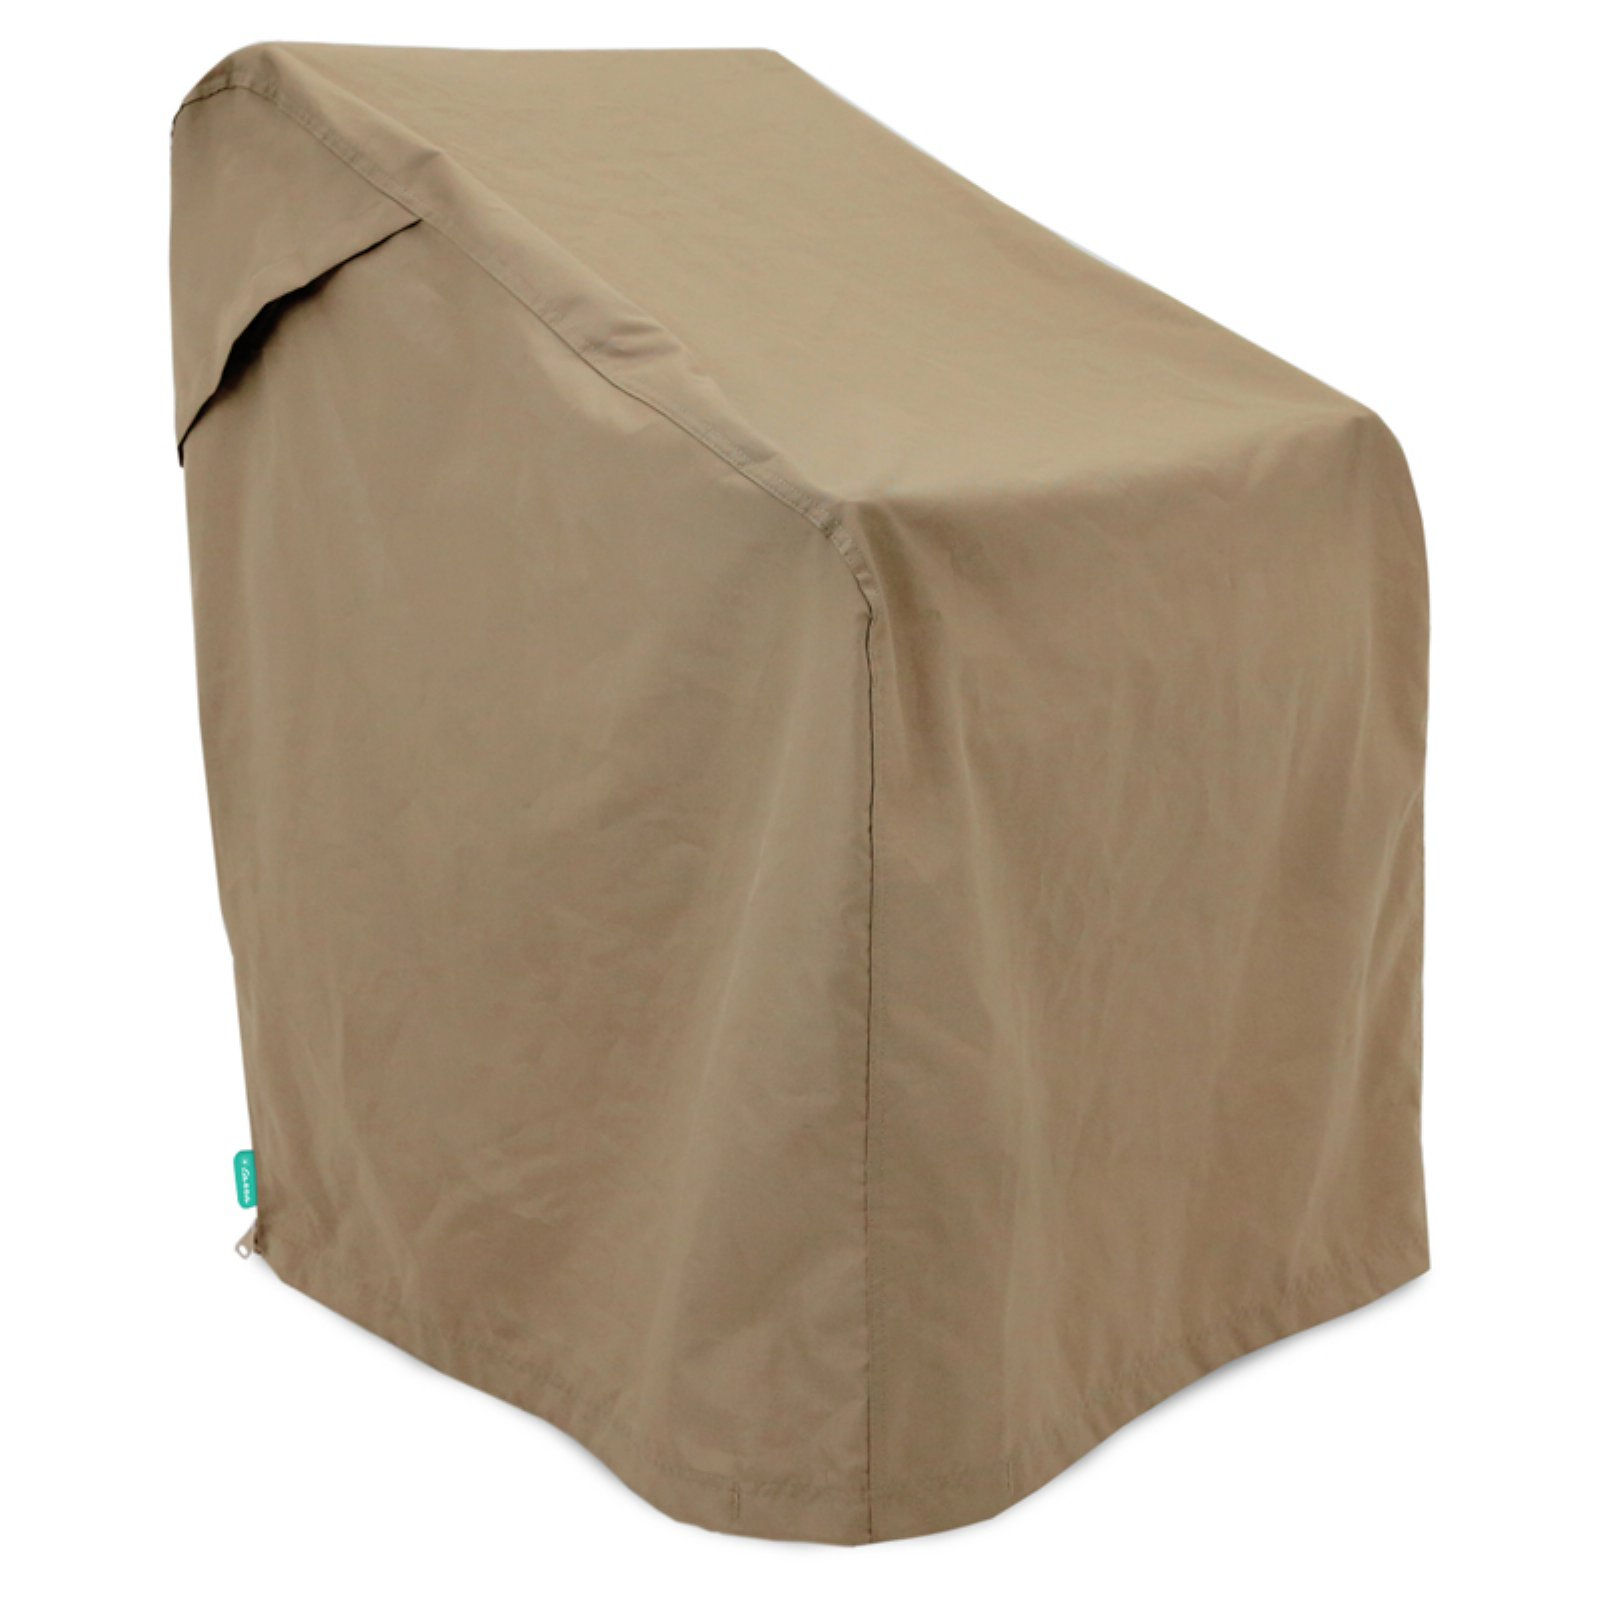 Tarra Home Universal Outdoor UFCCP303035PT Patio Chair Cover